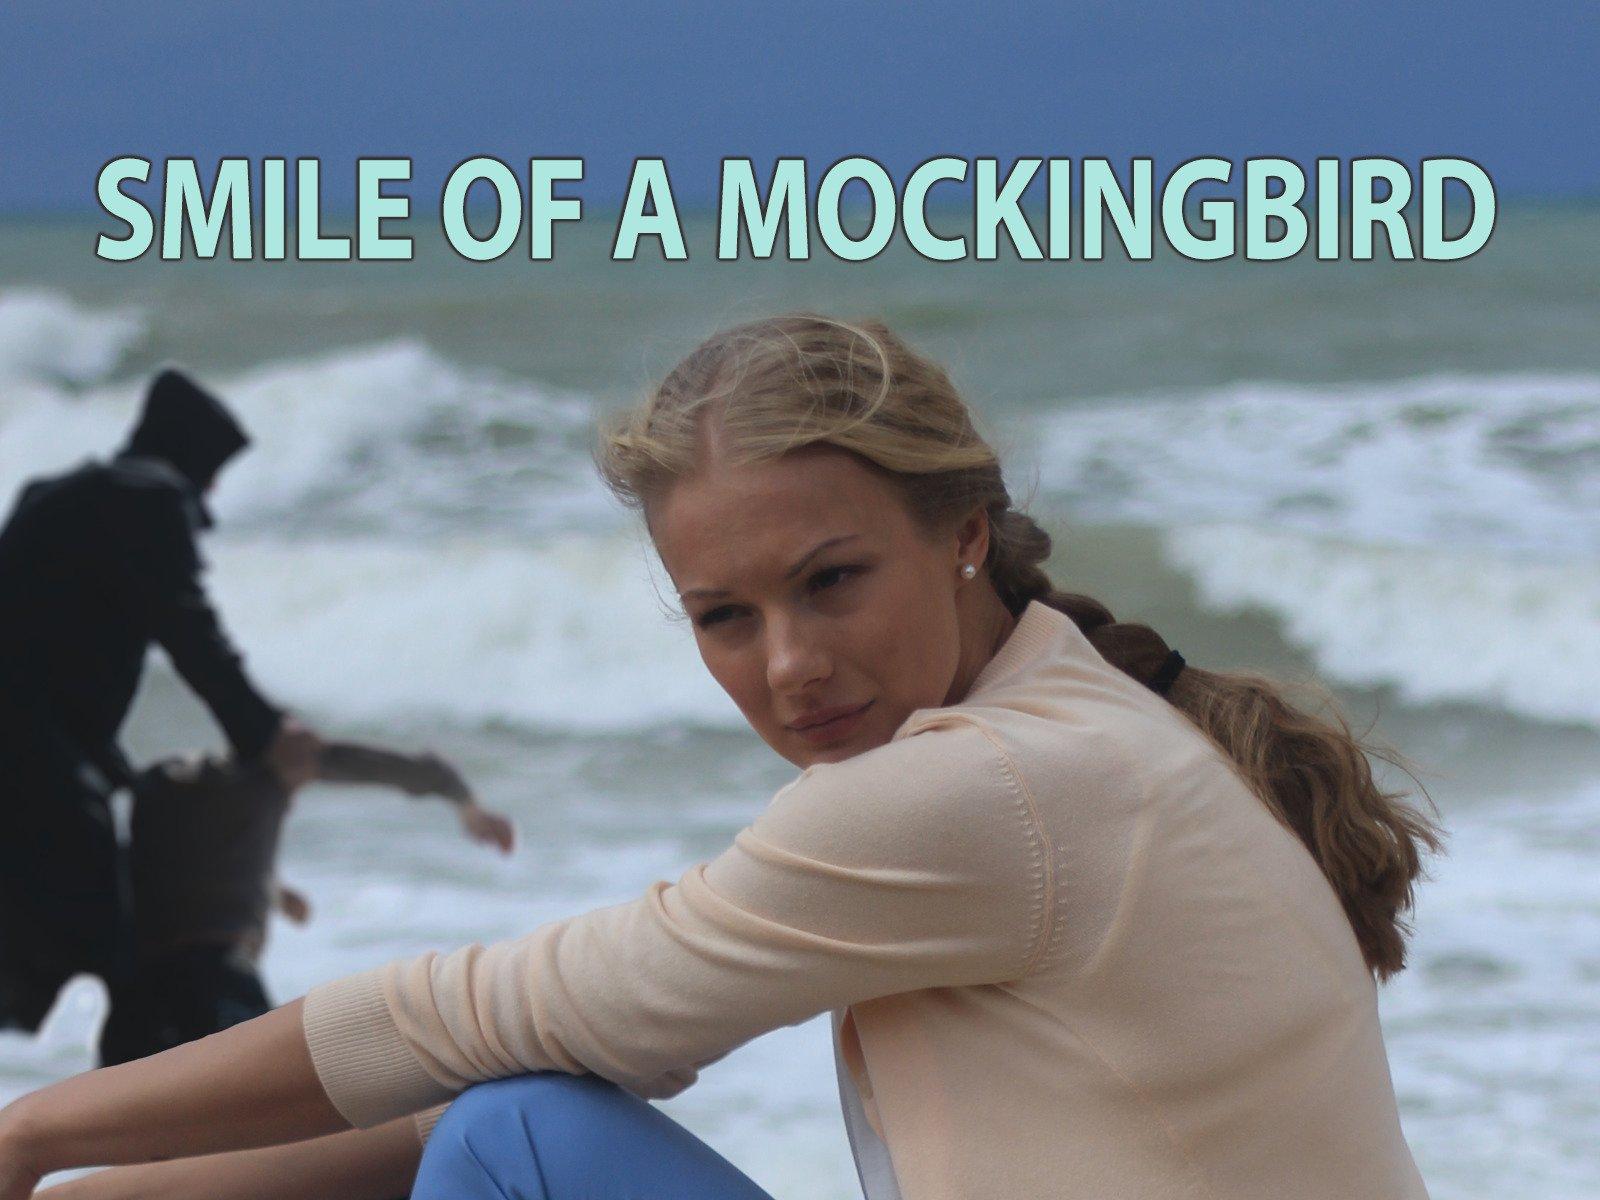 Smile of A Mockingbird